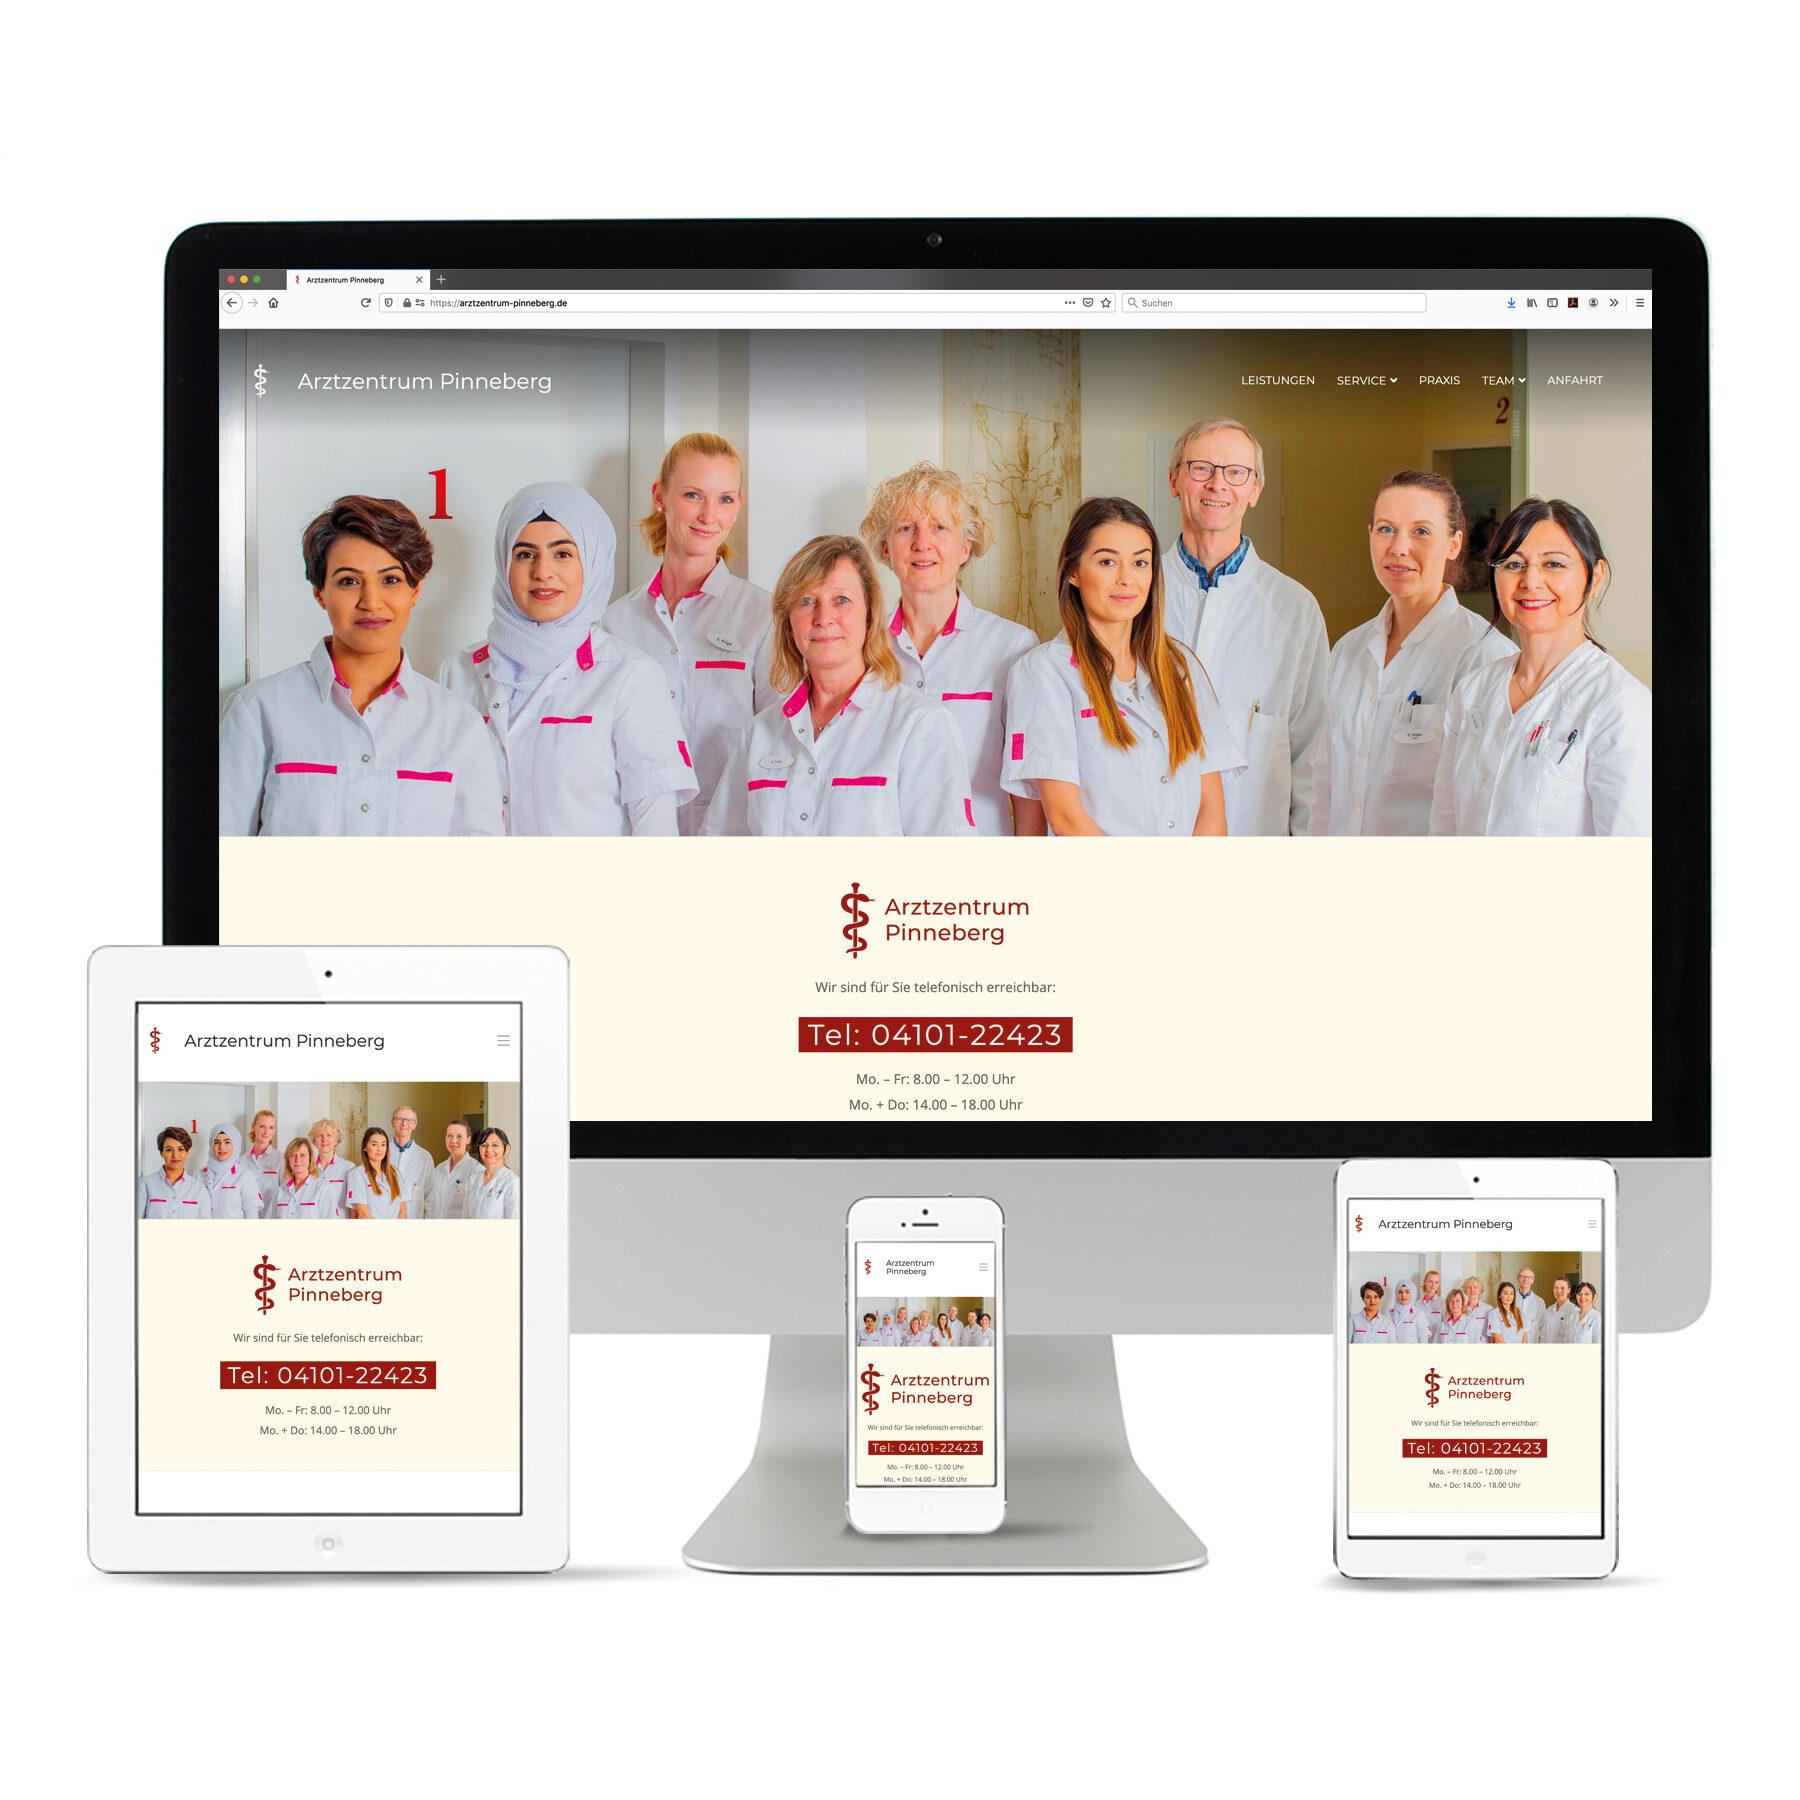 La Deutsche Vita - Internetseite Arztzentrum Pinneberg